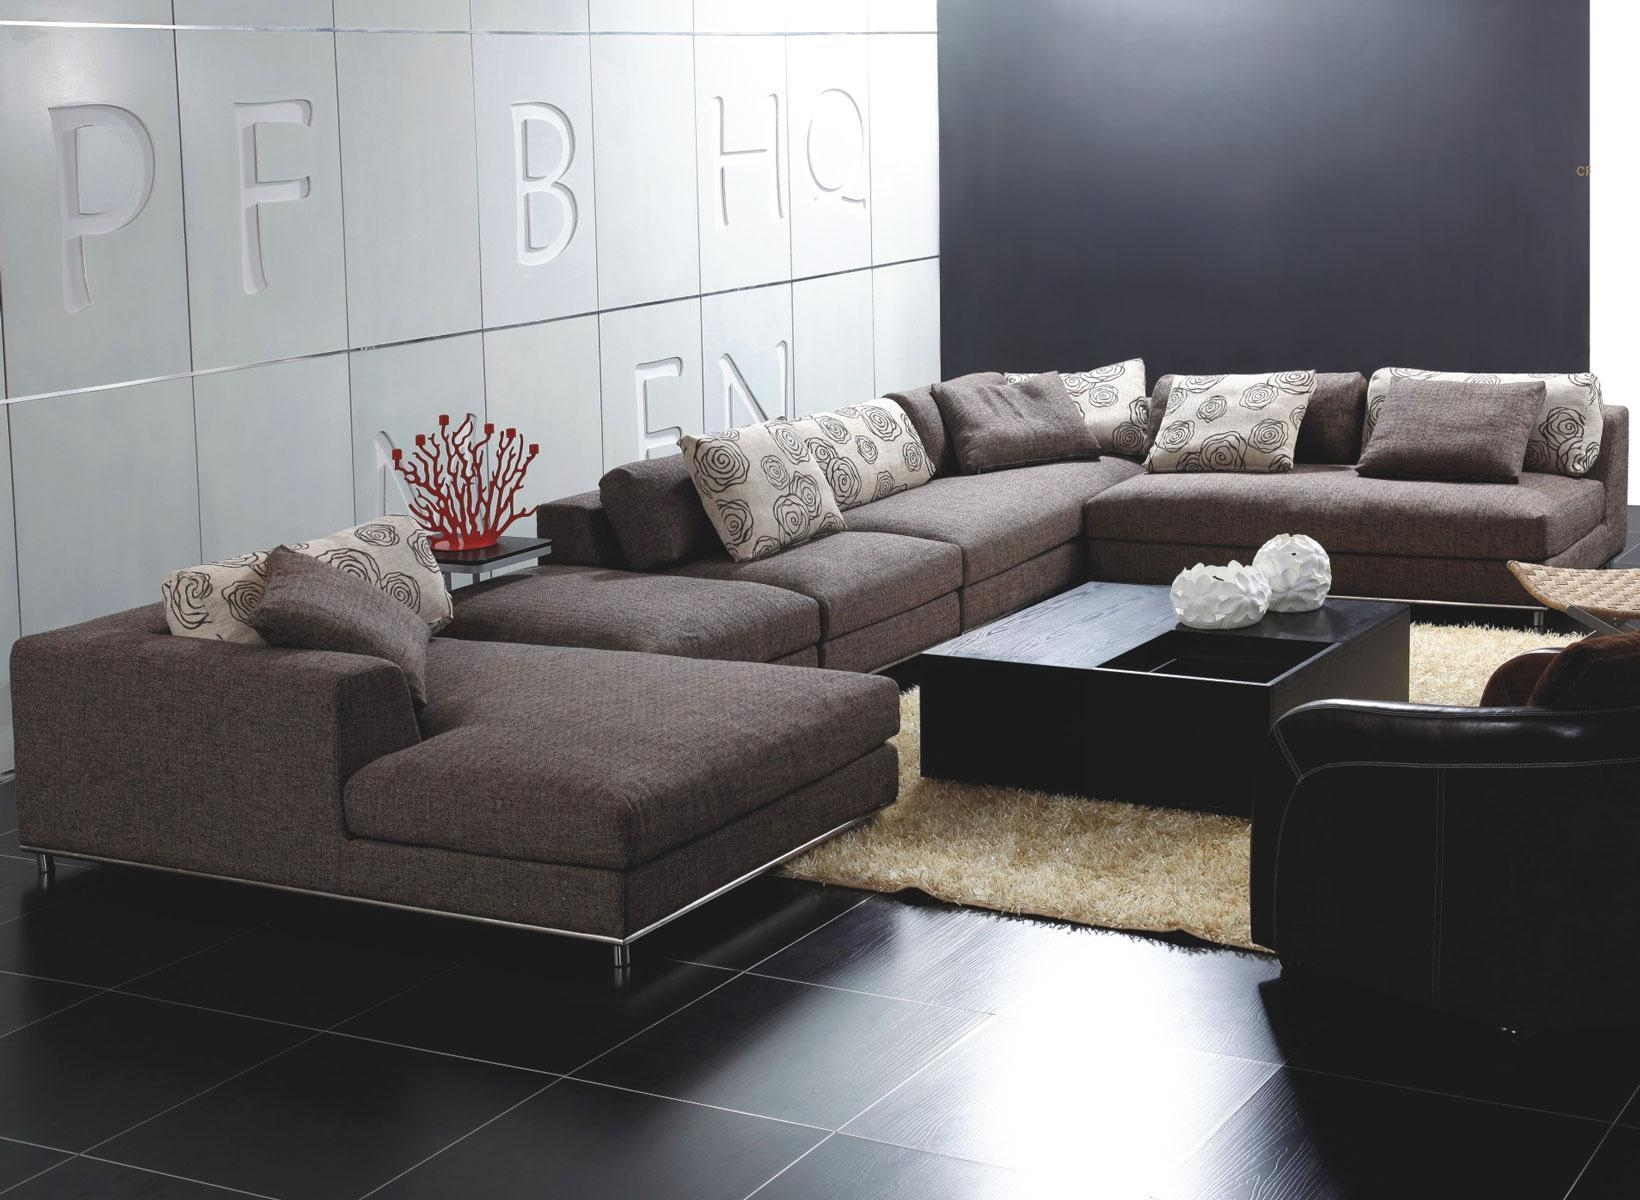 Contemporary Fabric Sectional Sofas #17314 For Contemporary Fabric Sofas (View 4 of 20)